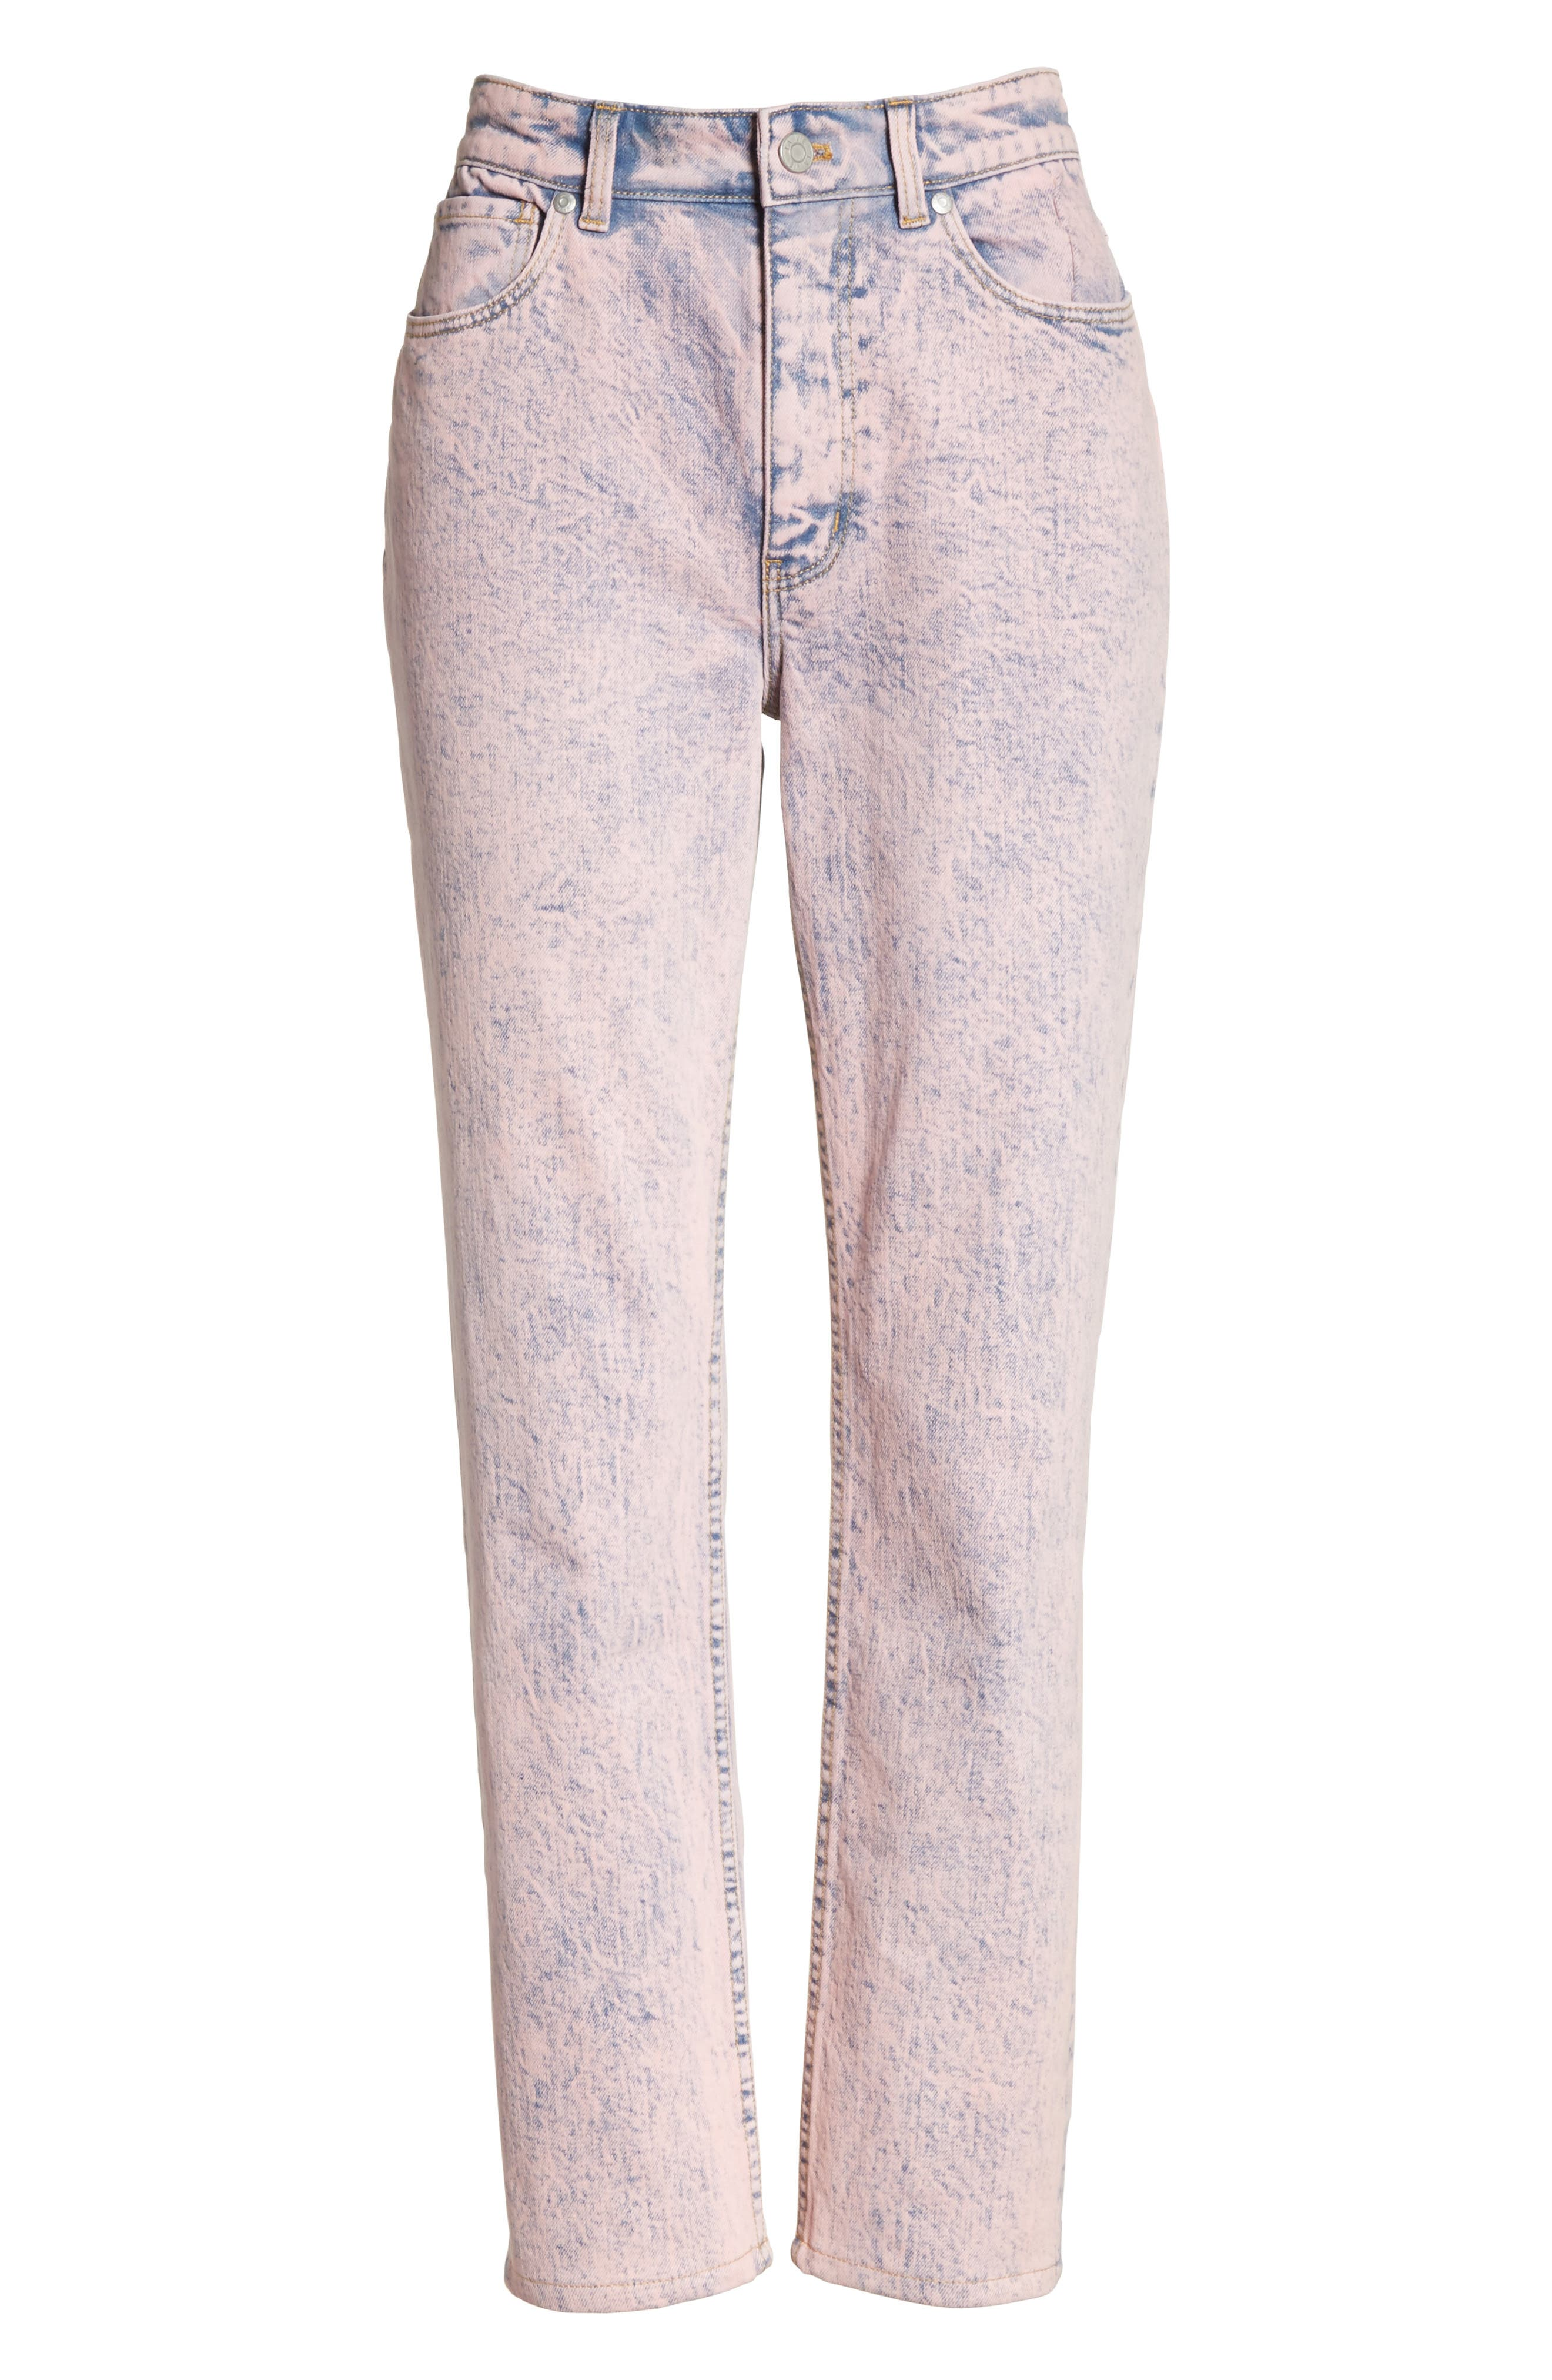 Ines Acid Wash Crop Jeans,                             Alternate thumbnail 6, color,                             658